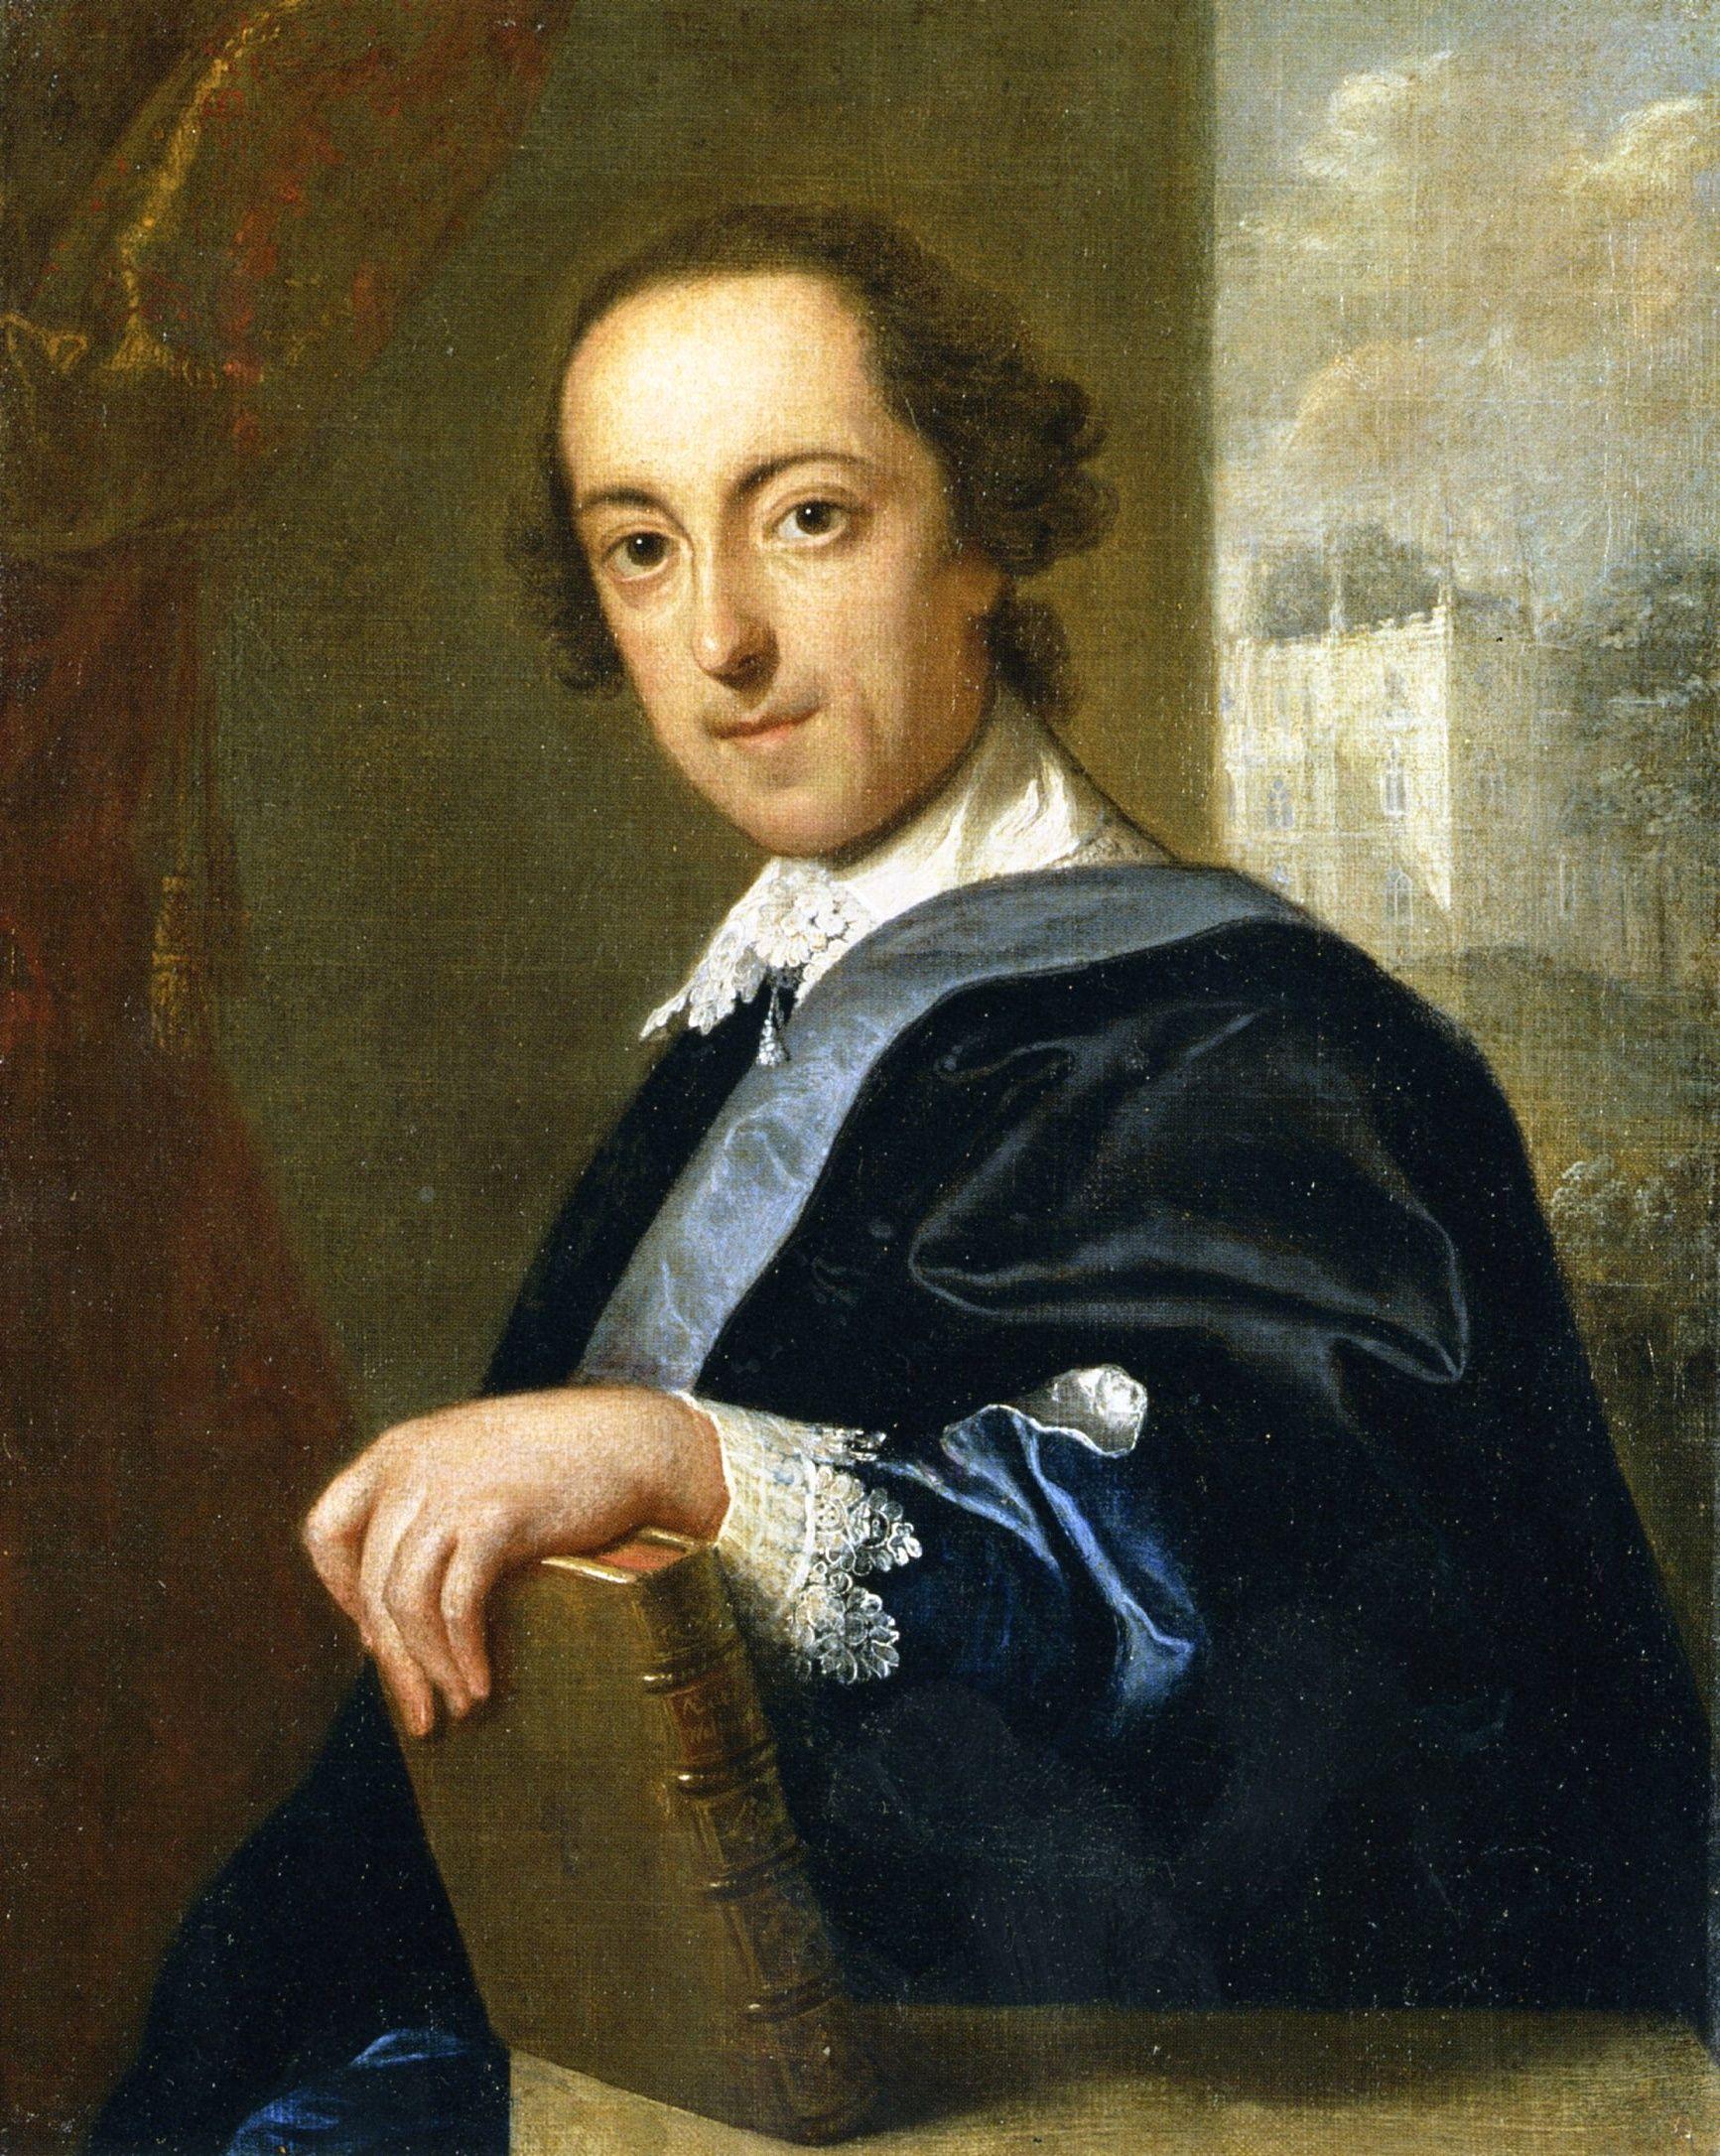 Robert et Horace Walpole (French Edition)